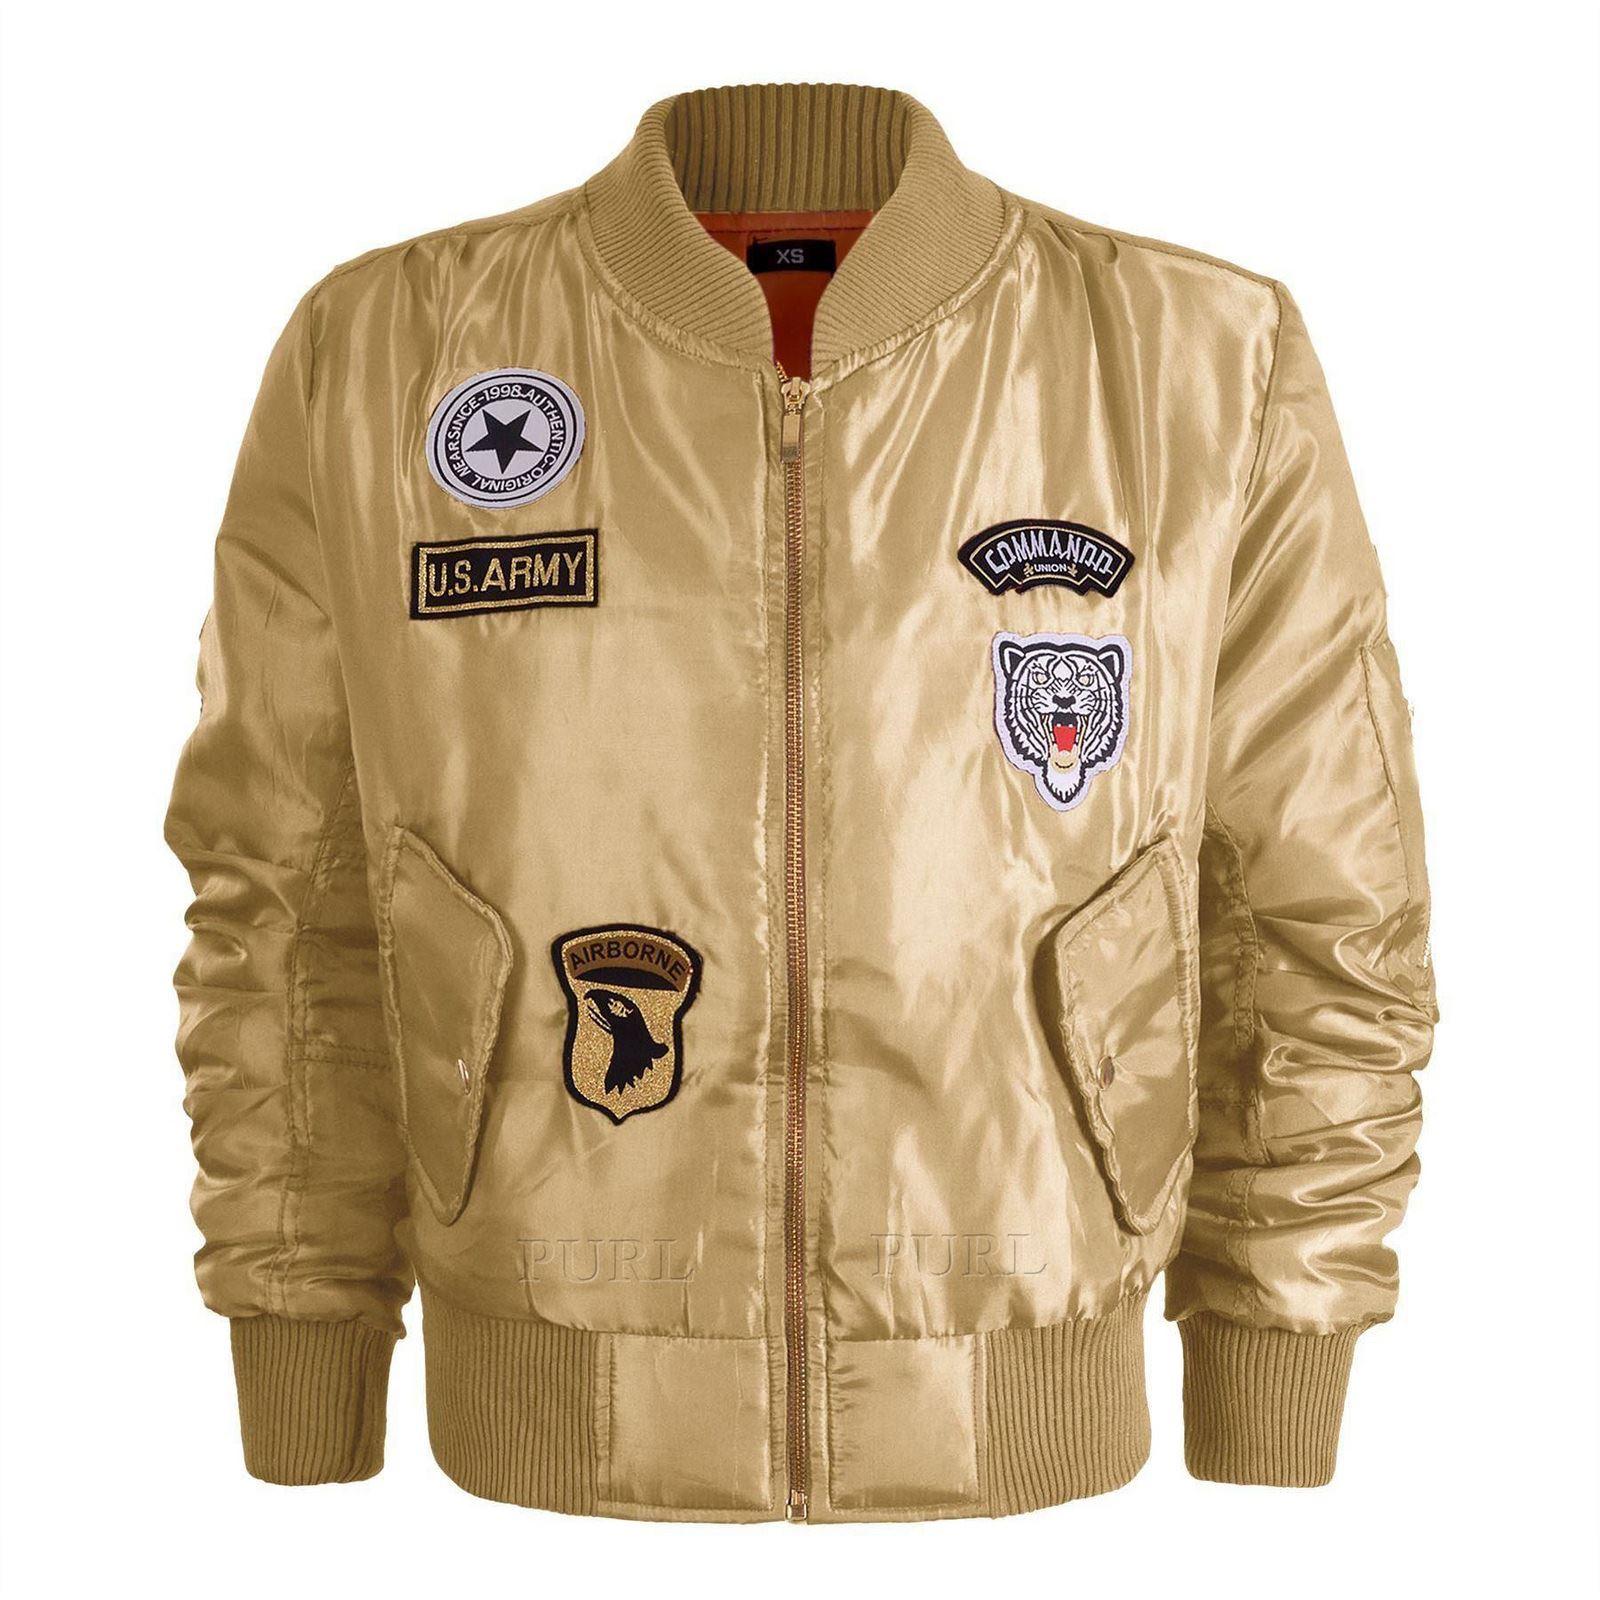 Womens Vintage Bomber Jacket Ladies Plus Size US Army Badges Biker Jacket UK6-26 | EBay